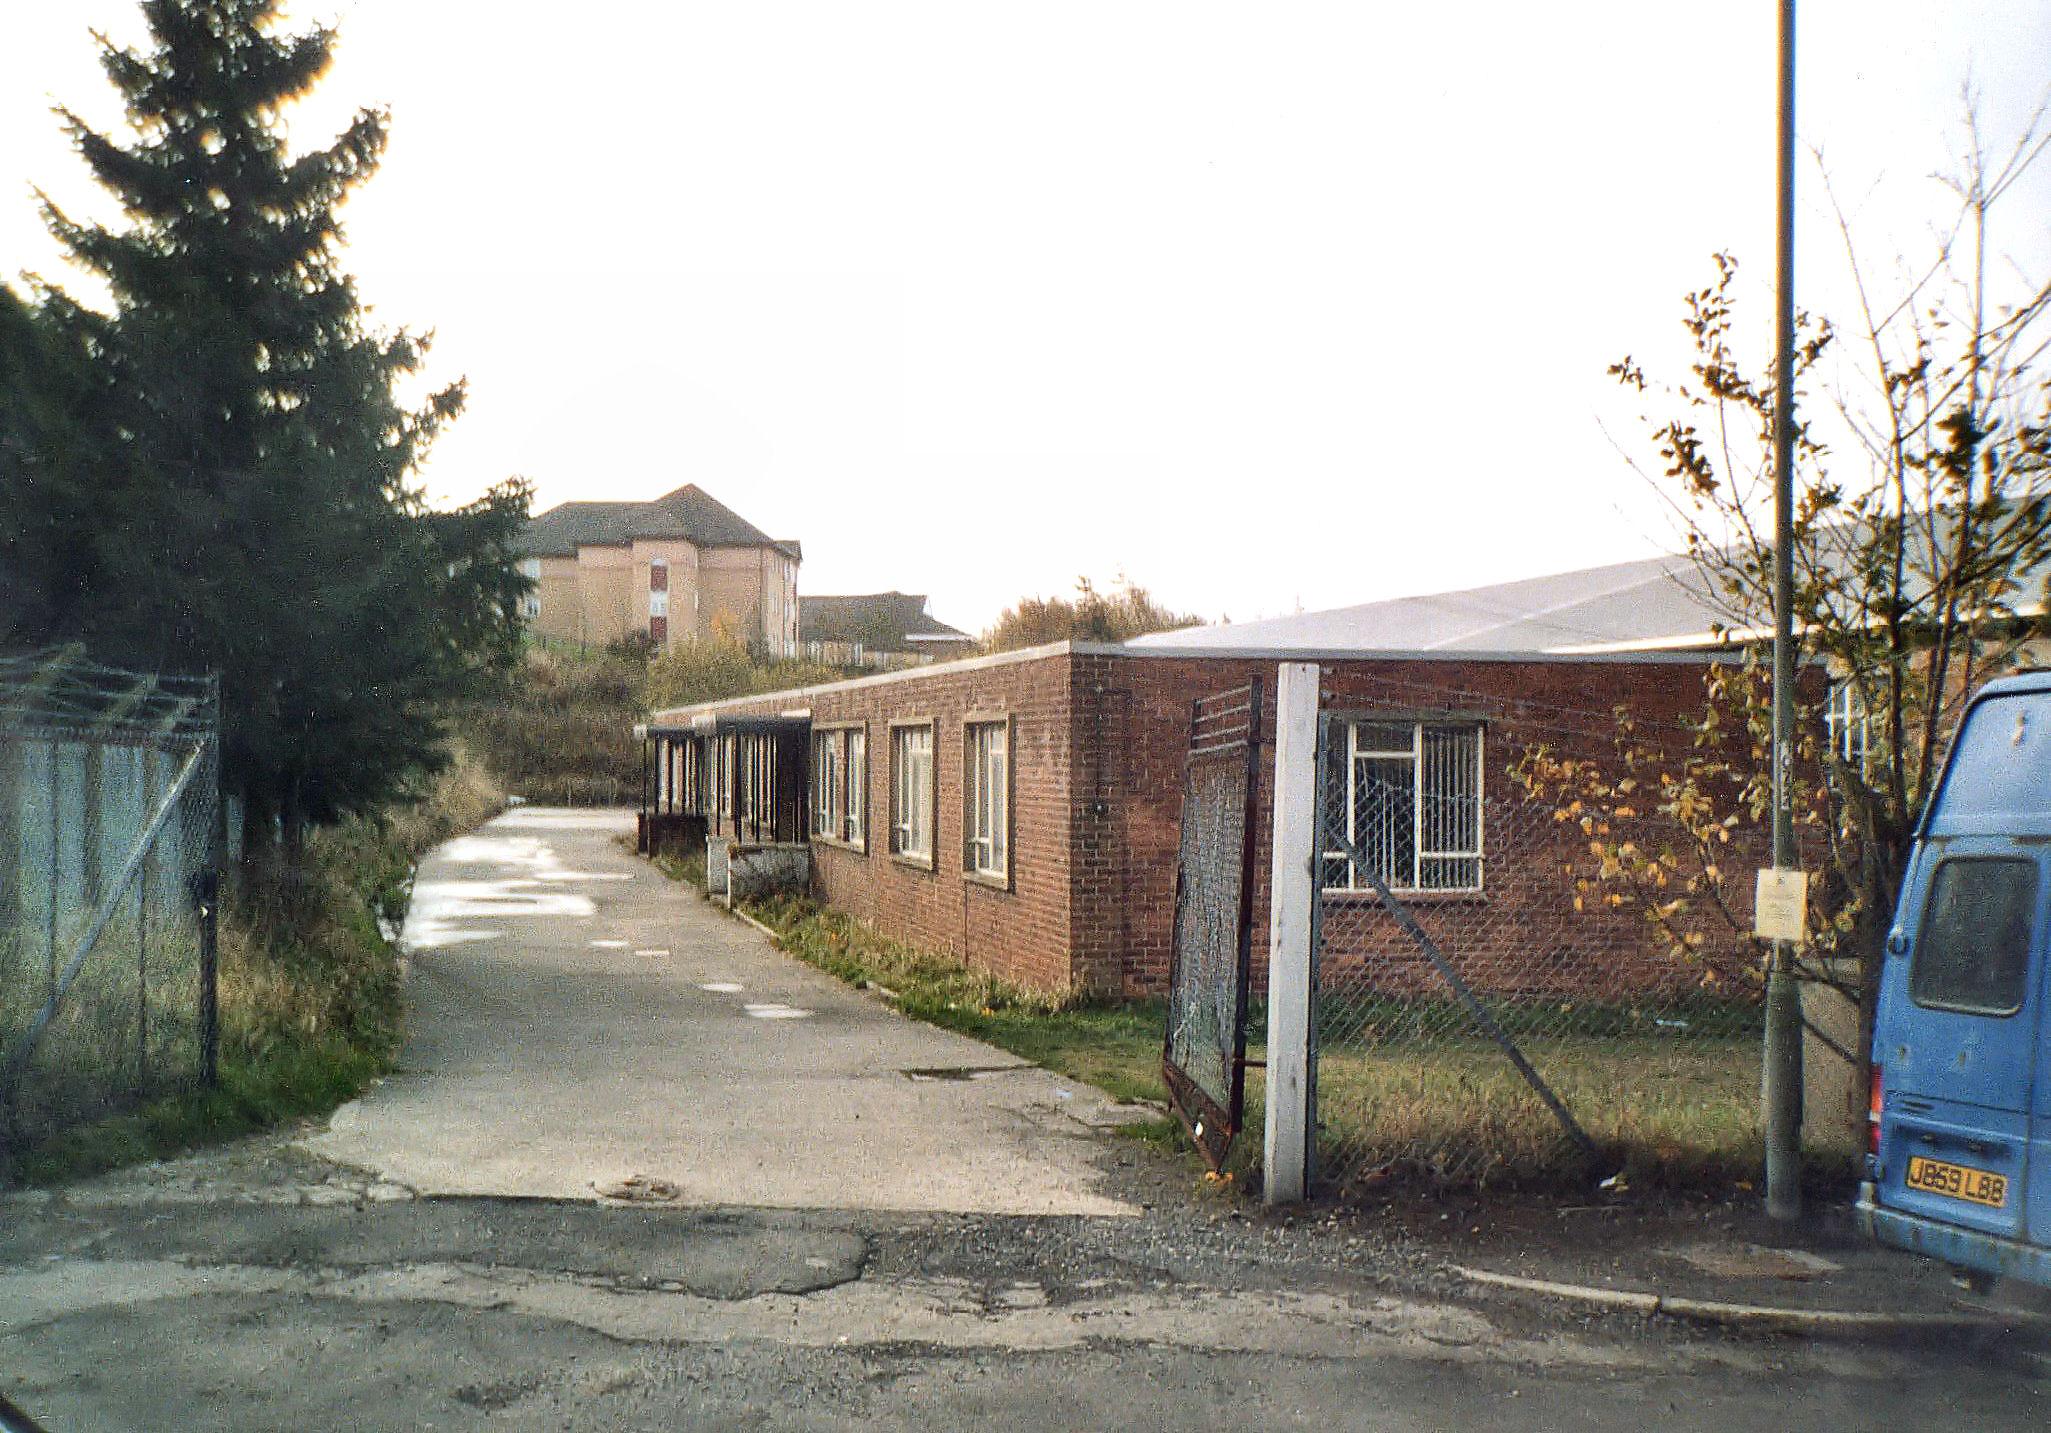 29. Nov 10th 2005. Pinkhams factory anthony street